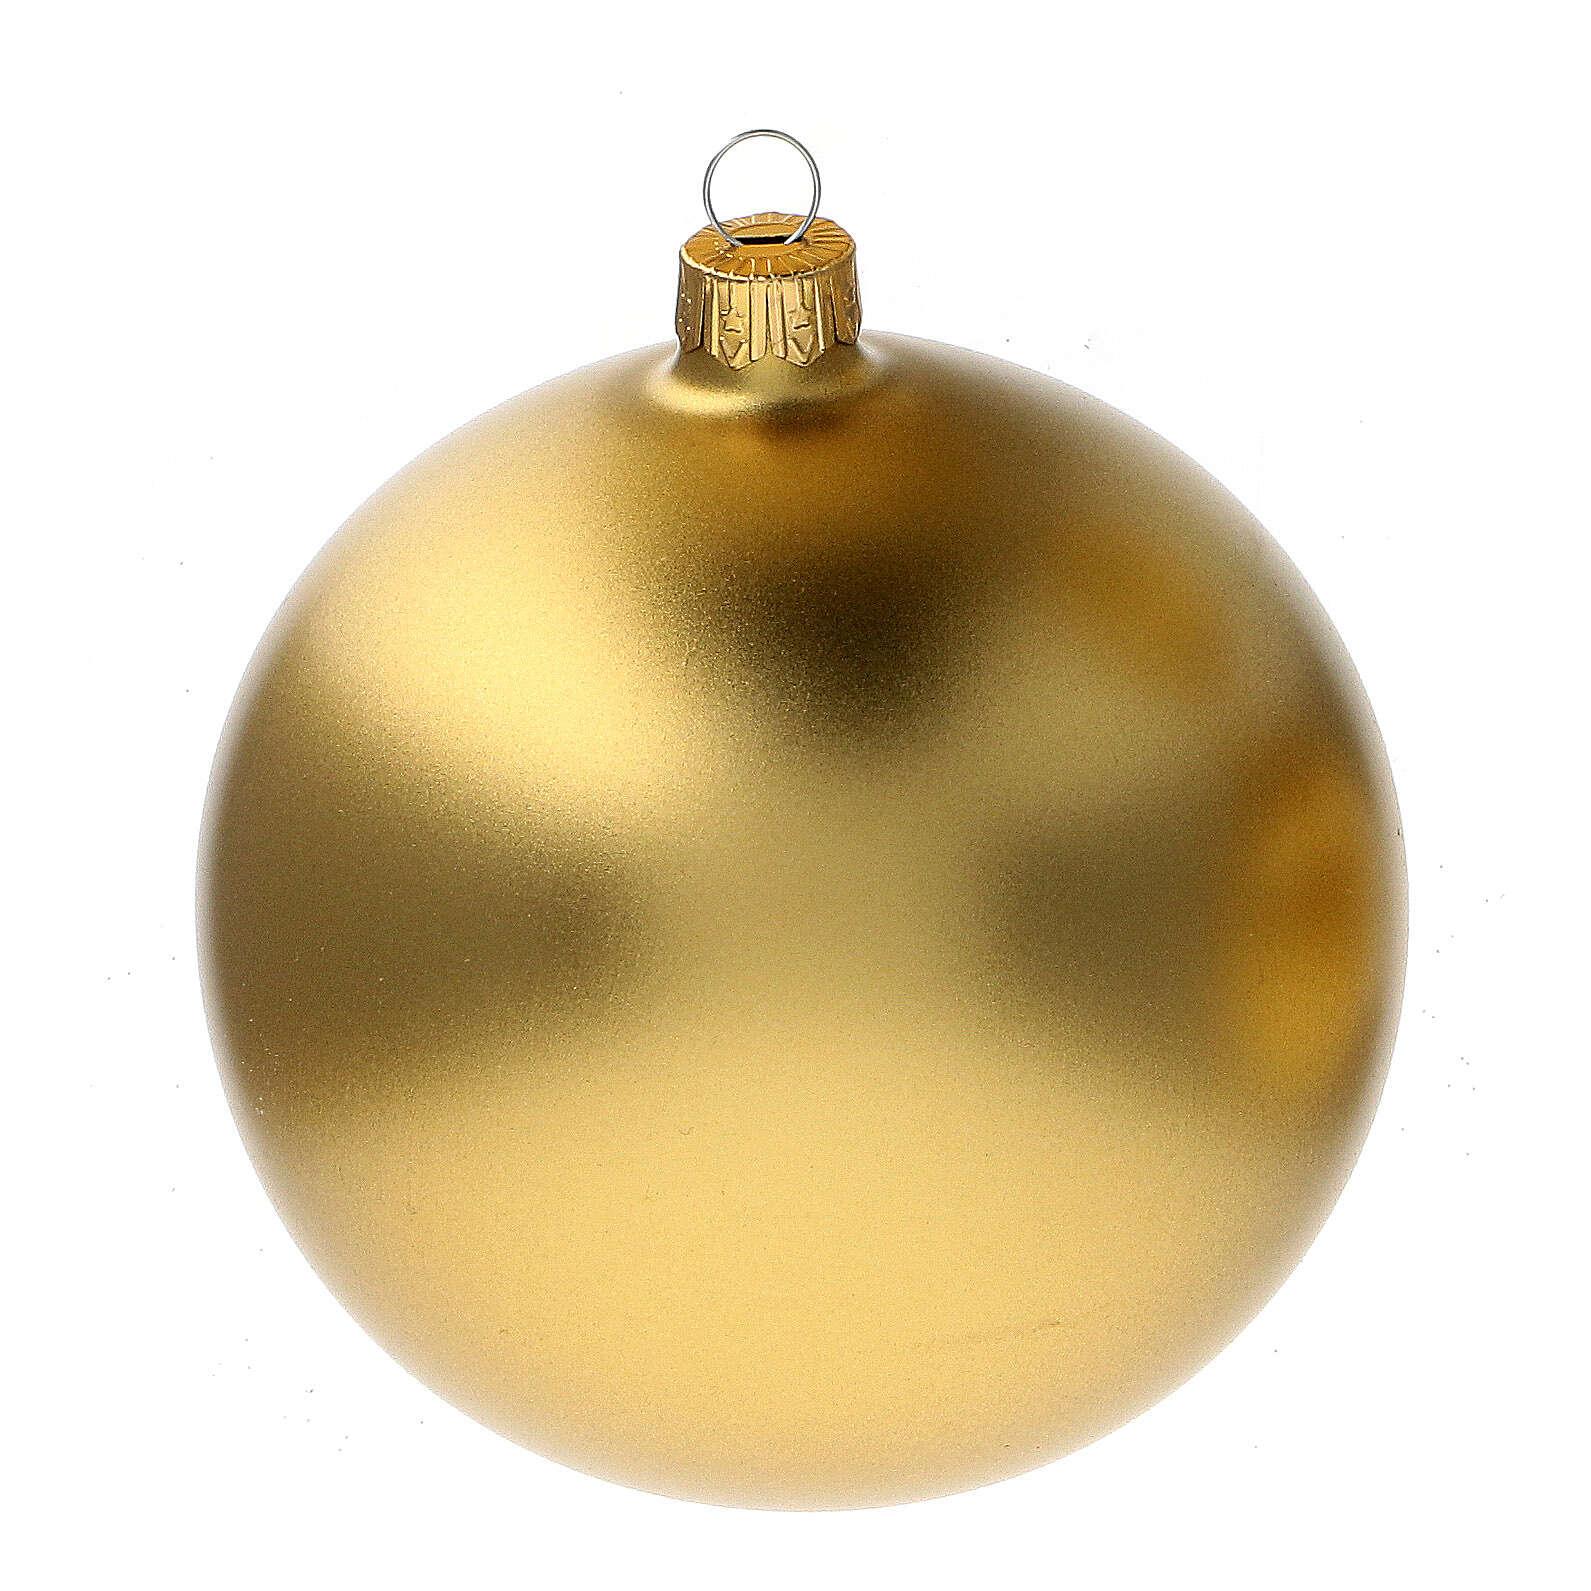 Bolas árvore de Natal vidro soprado ouro opaco 100 mm 4 unidades 4